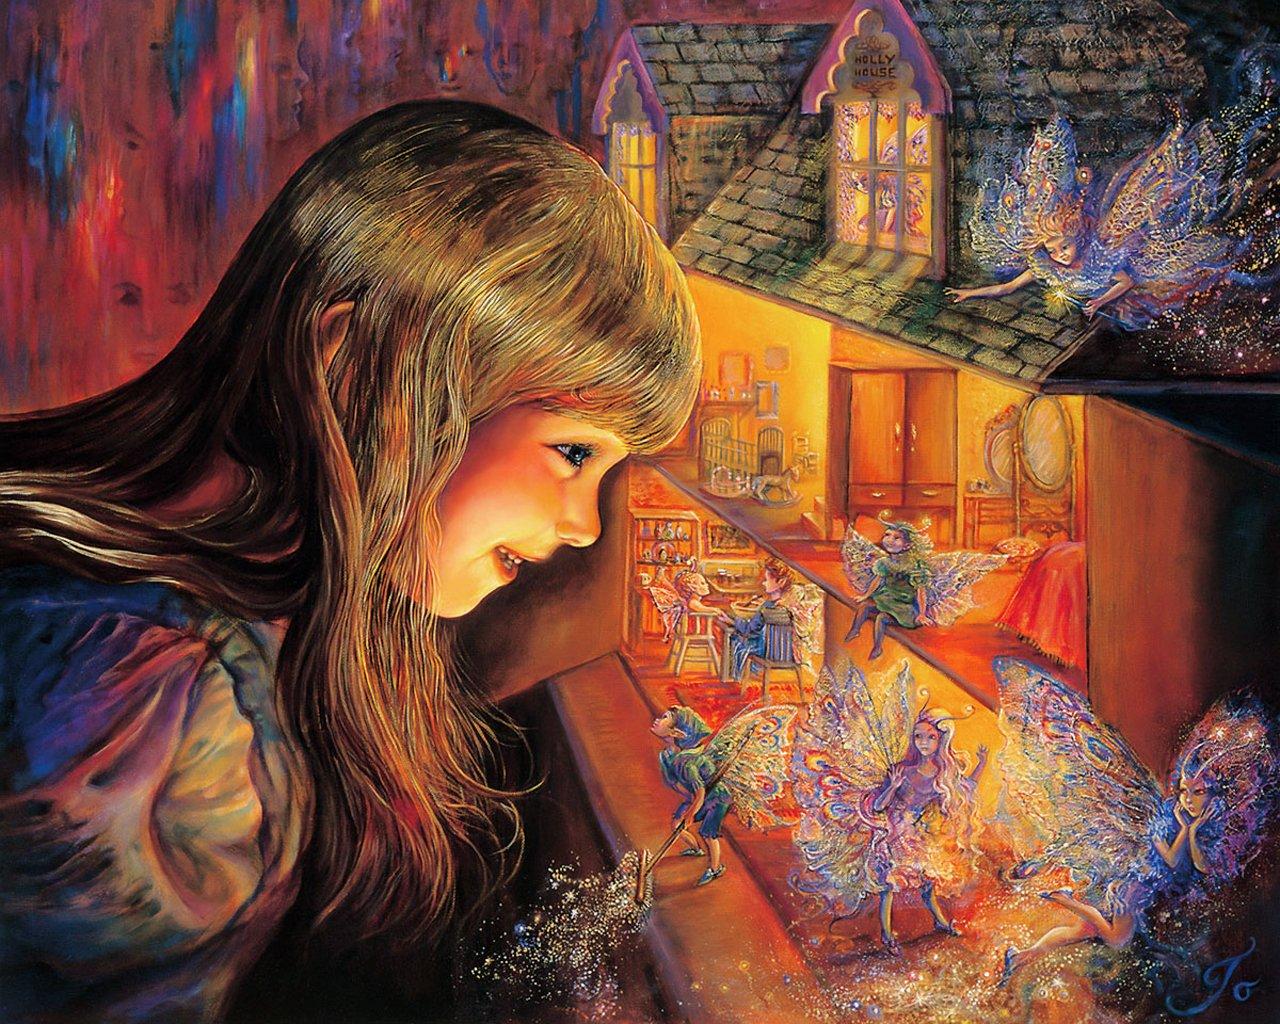 wallpaper josephine illustration fantasy - photo #11